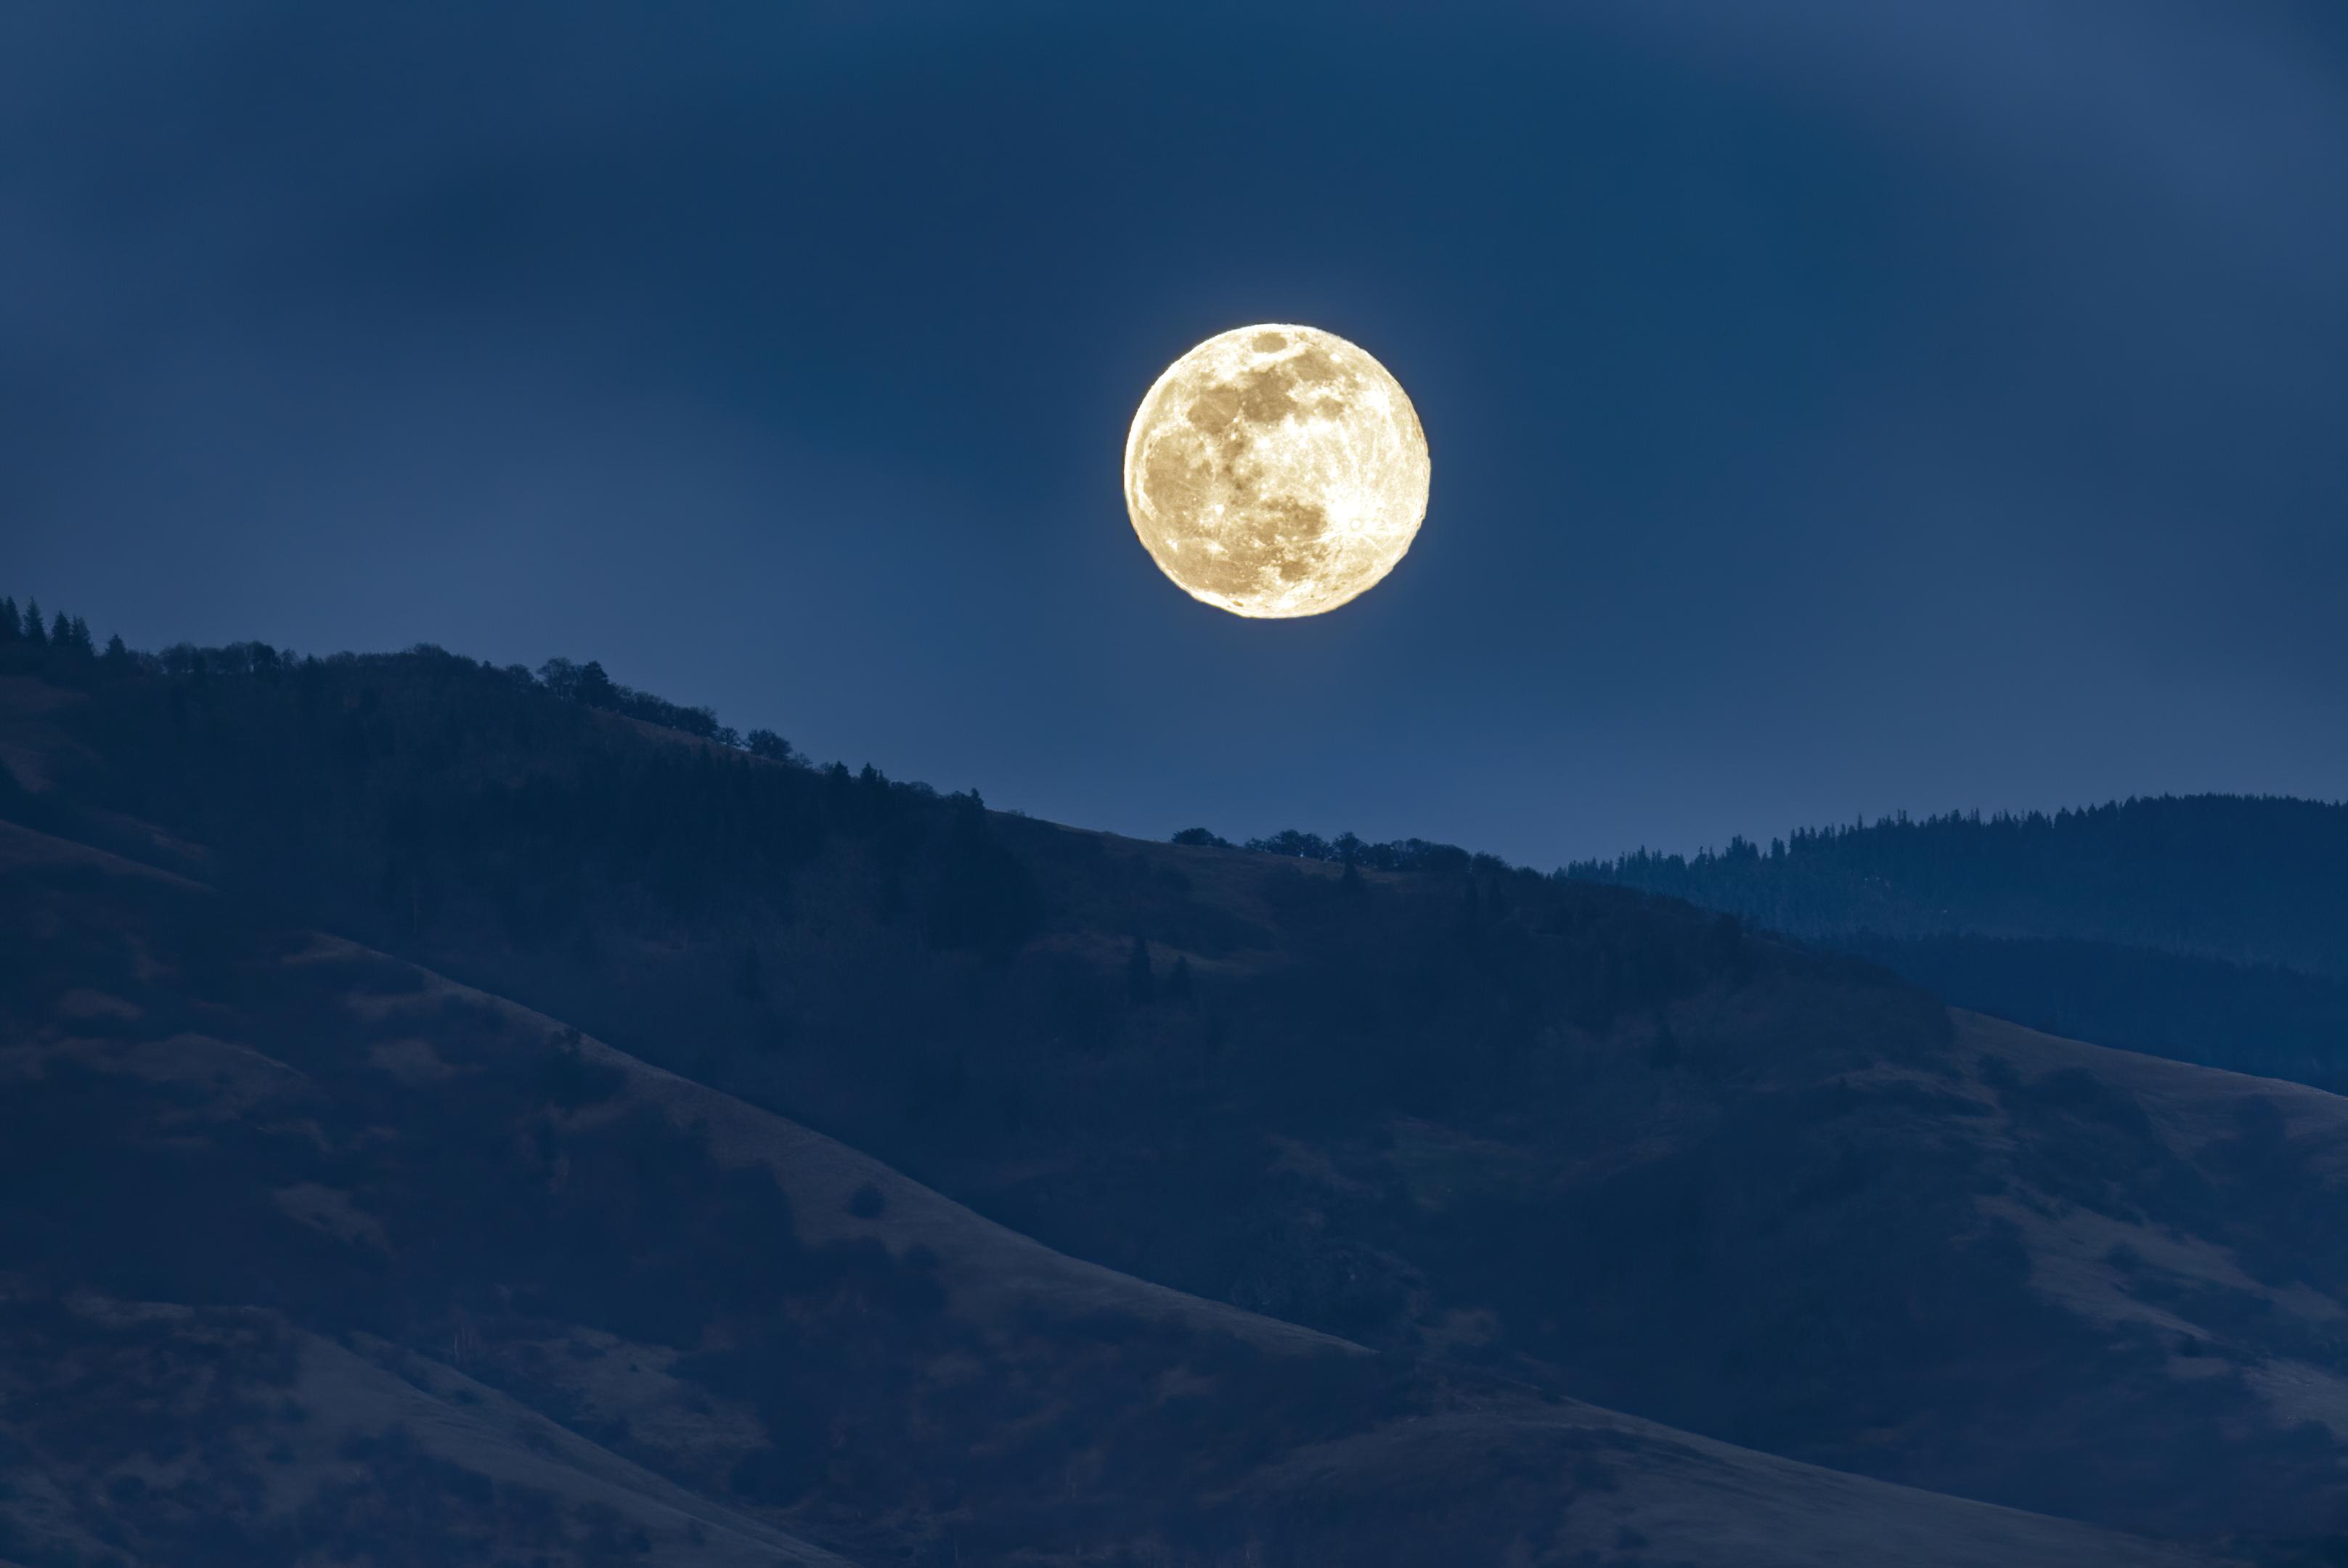 full moon ashland topaz ai denoise